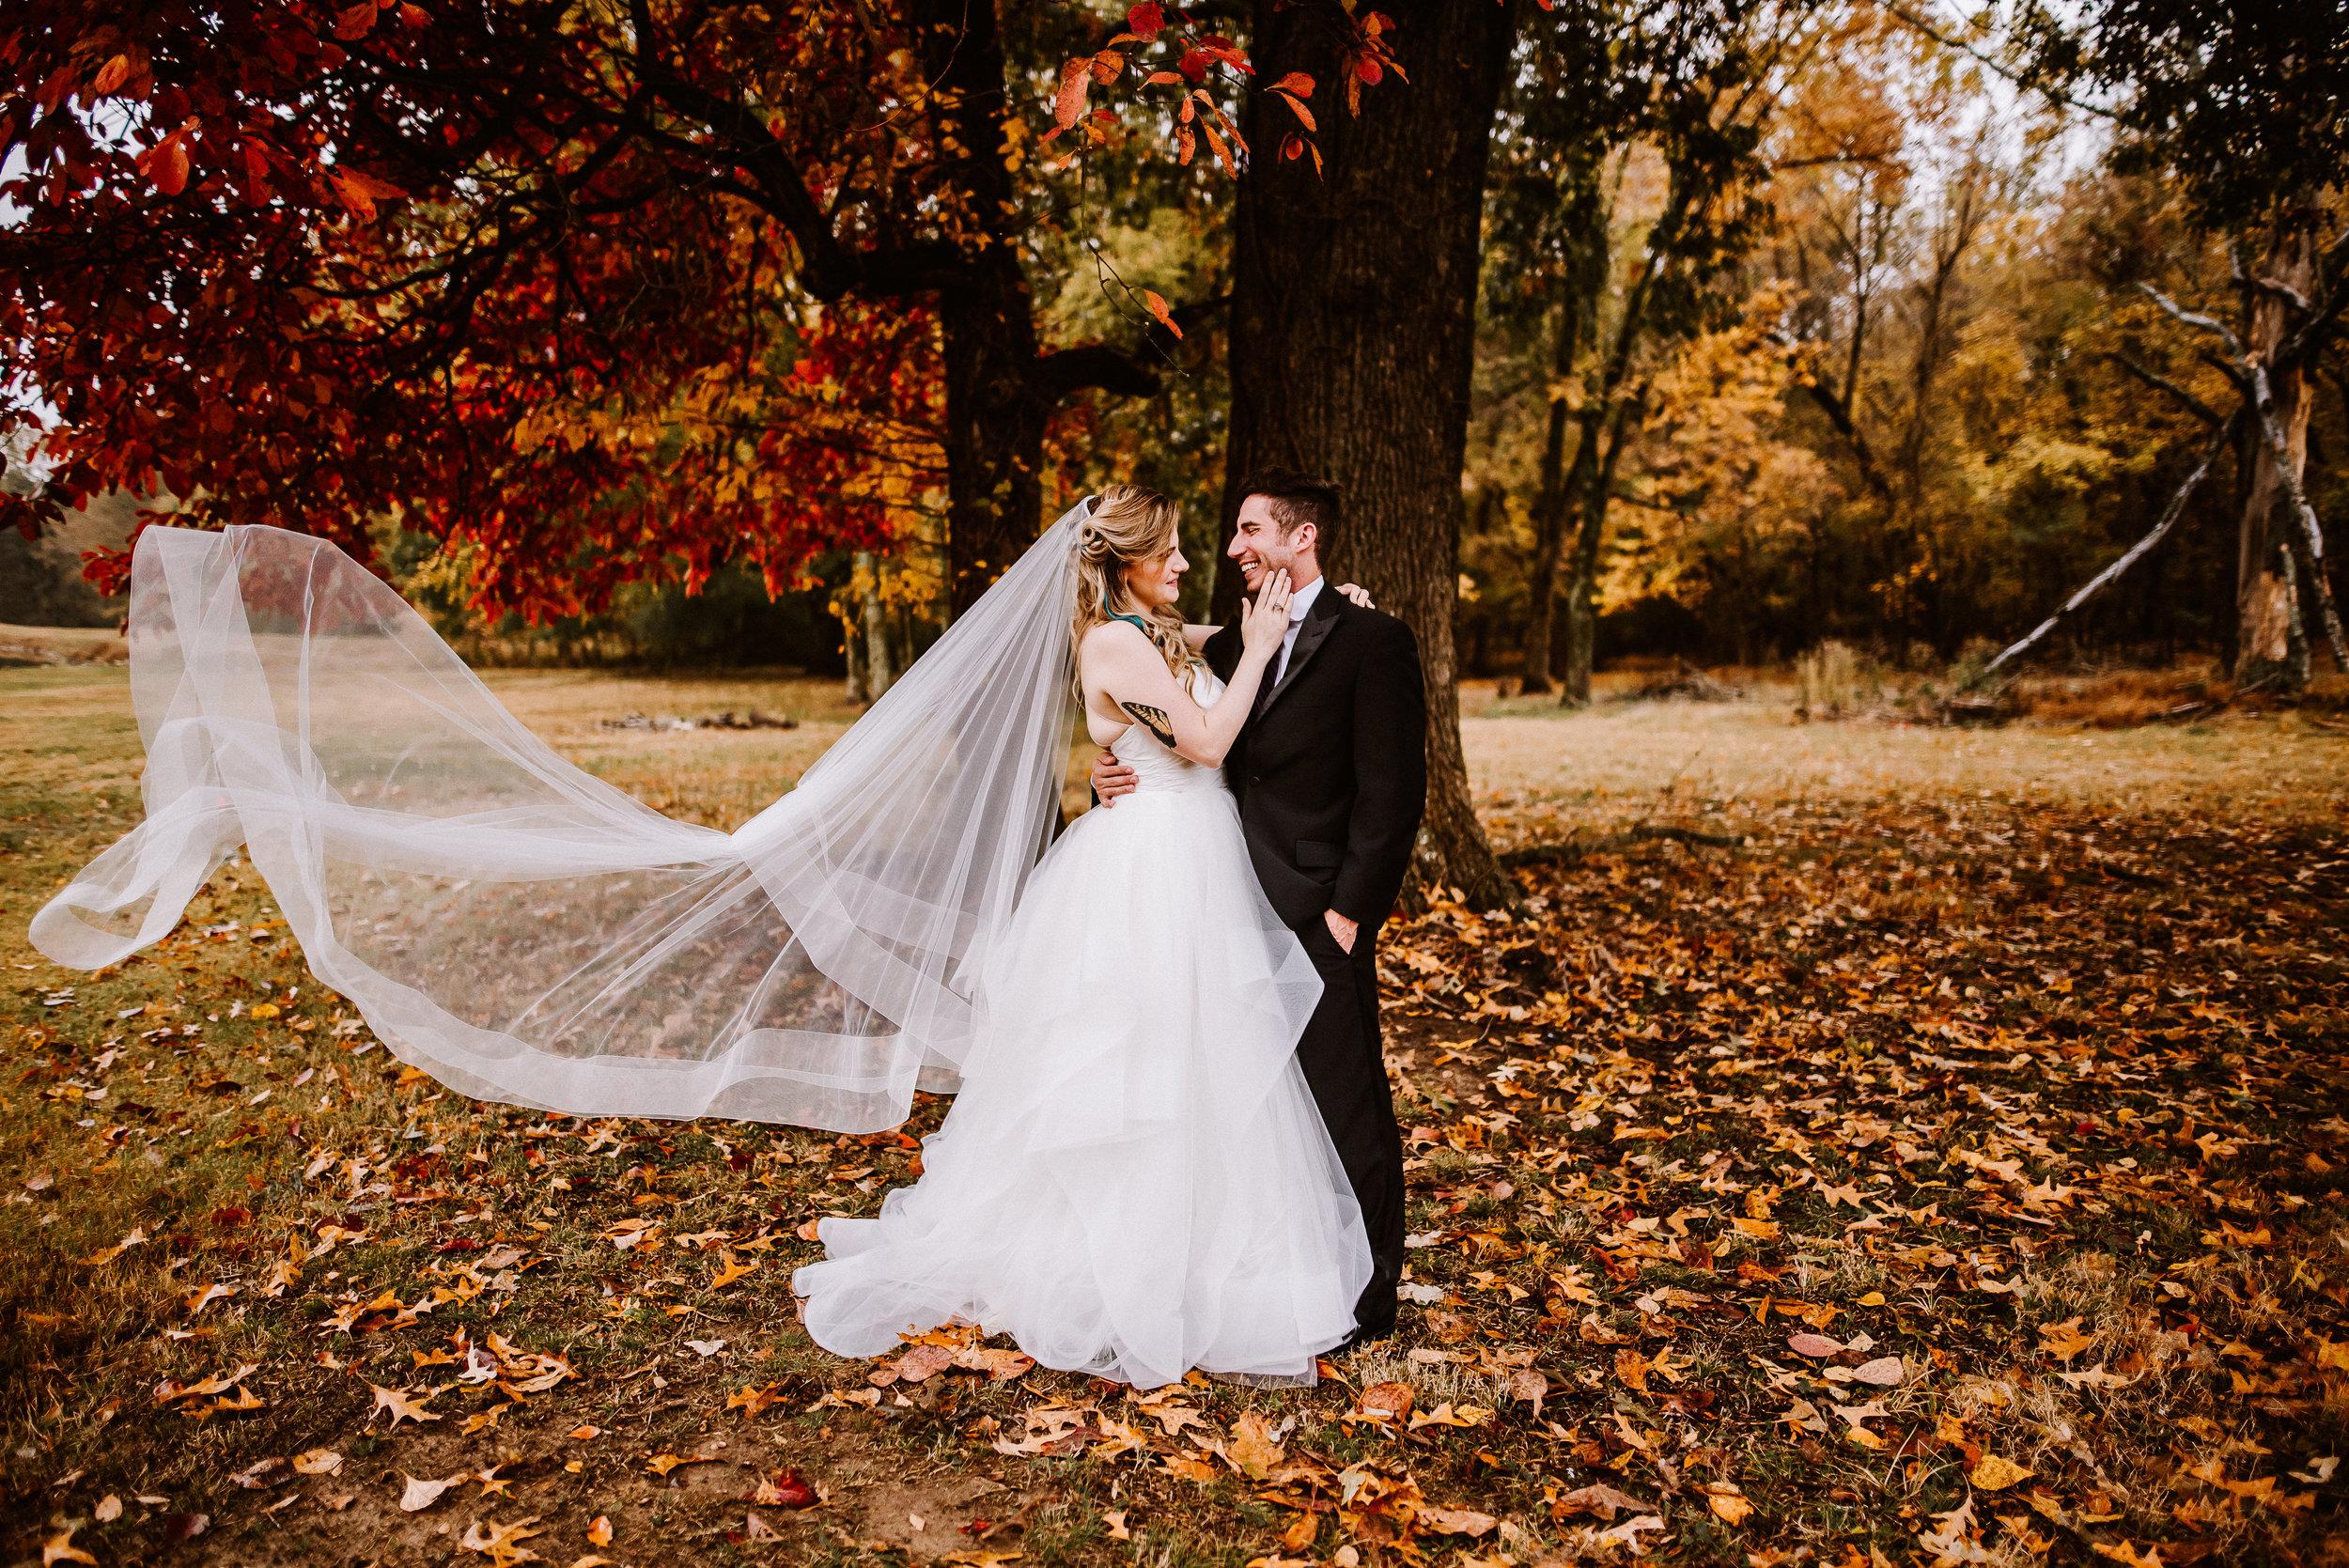 Lucchesi-Wedding_Shelby-Farms_Ashley-Benham-Photography-231.jpg